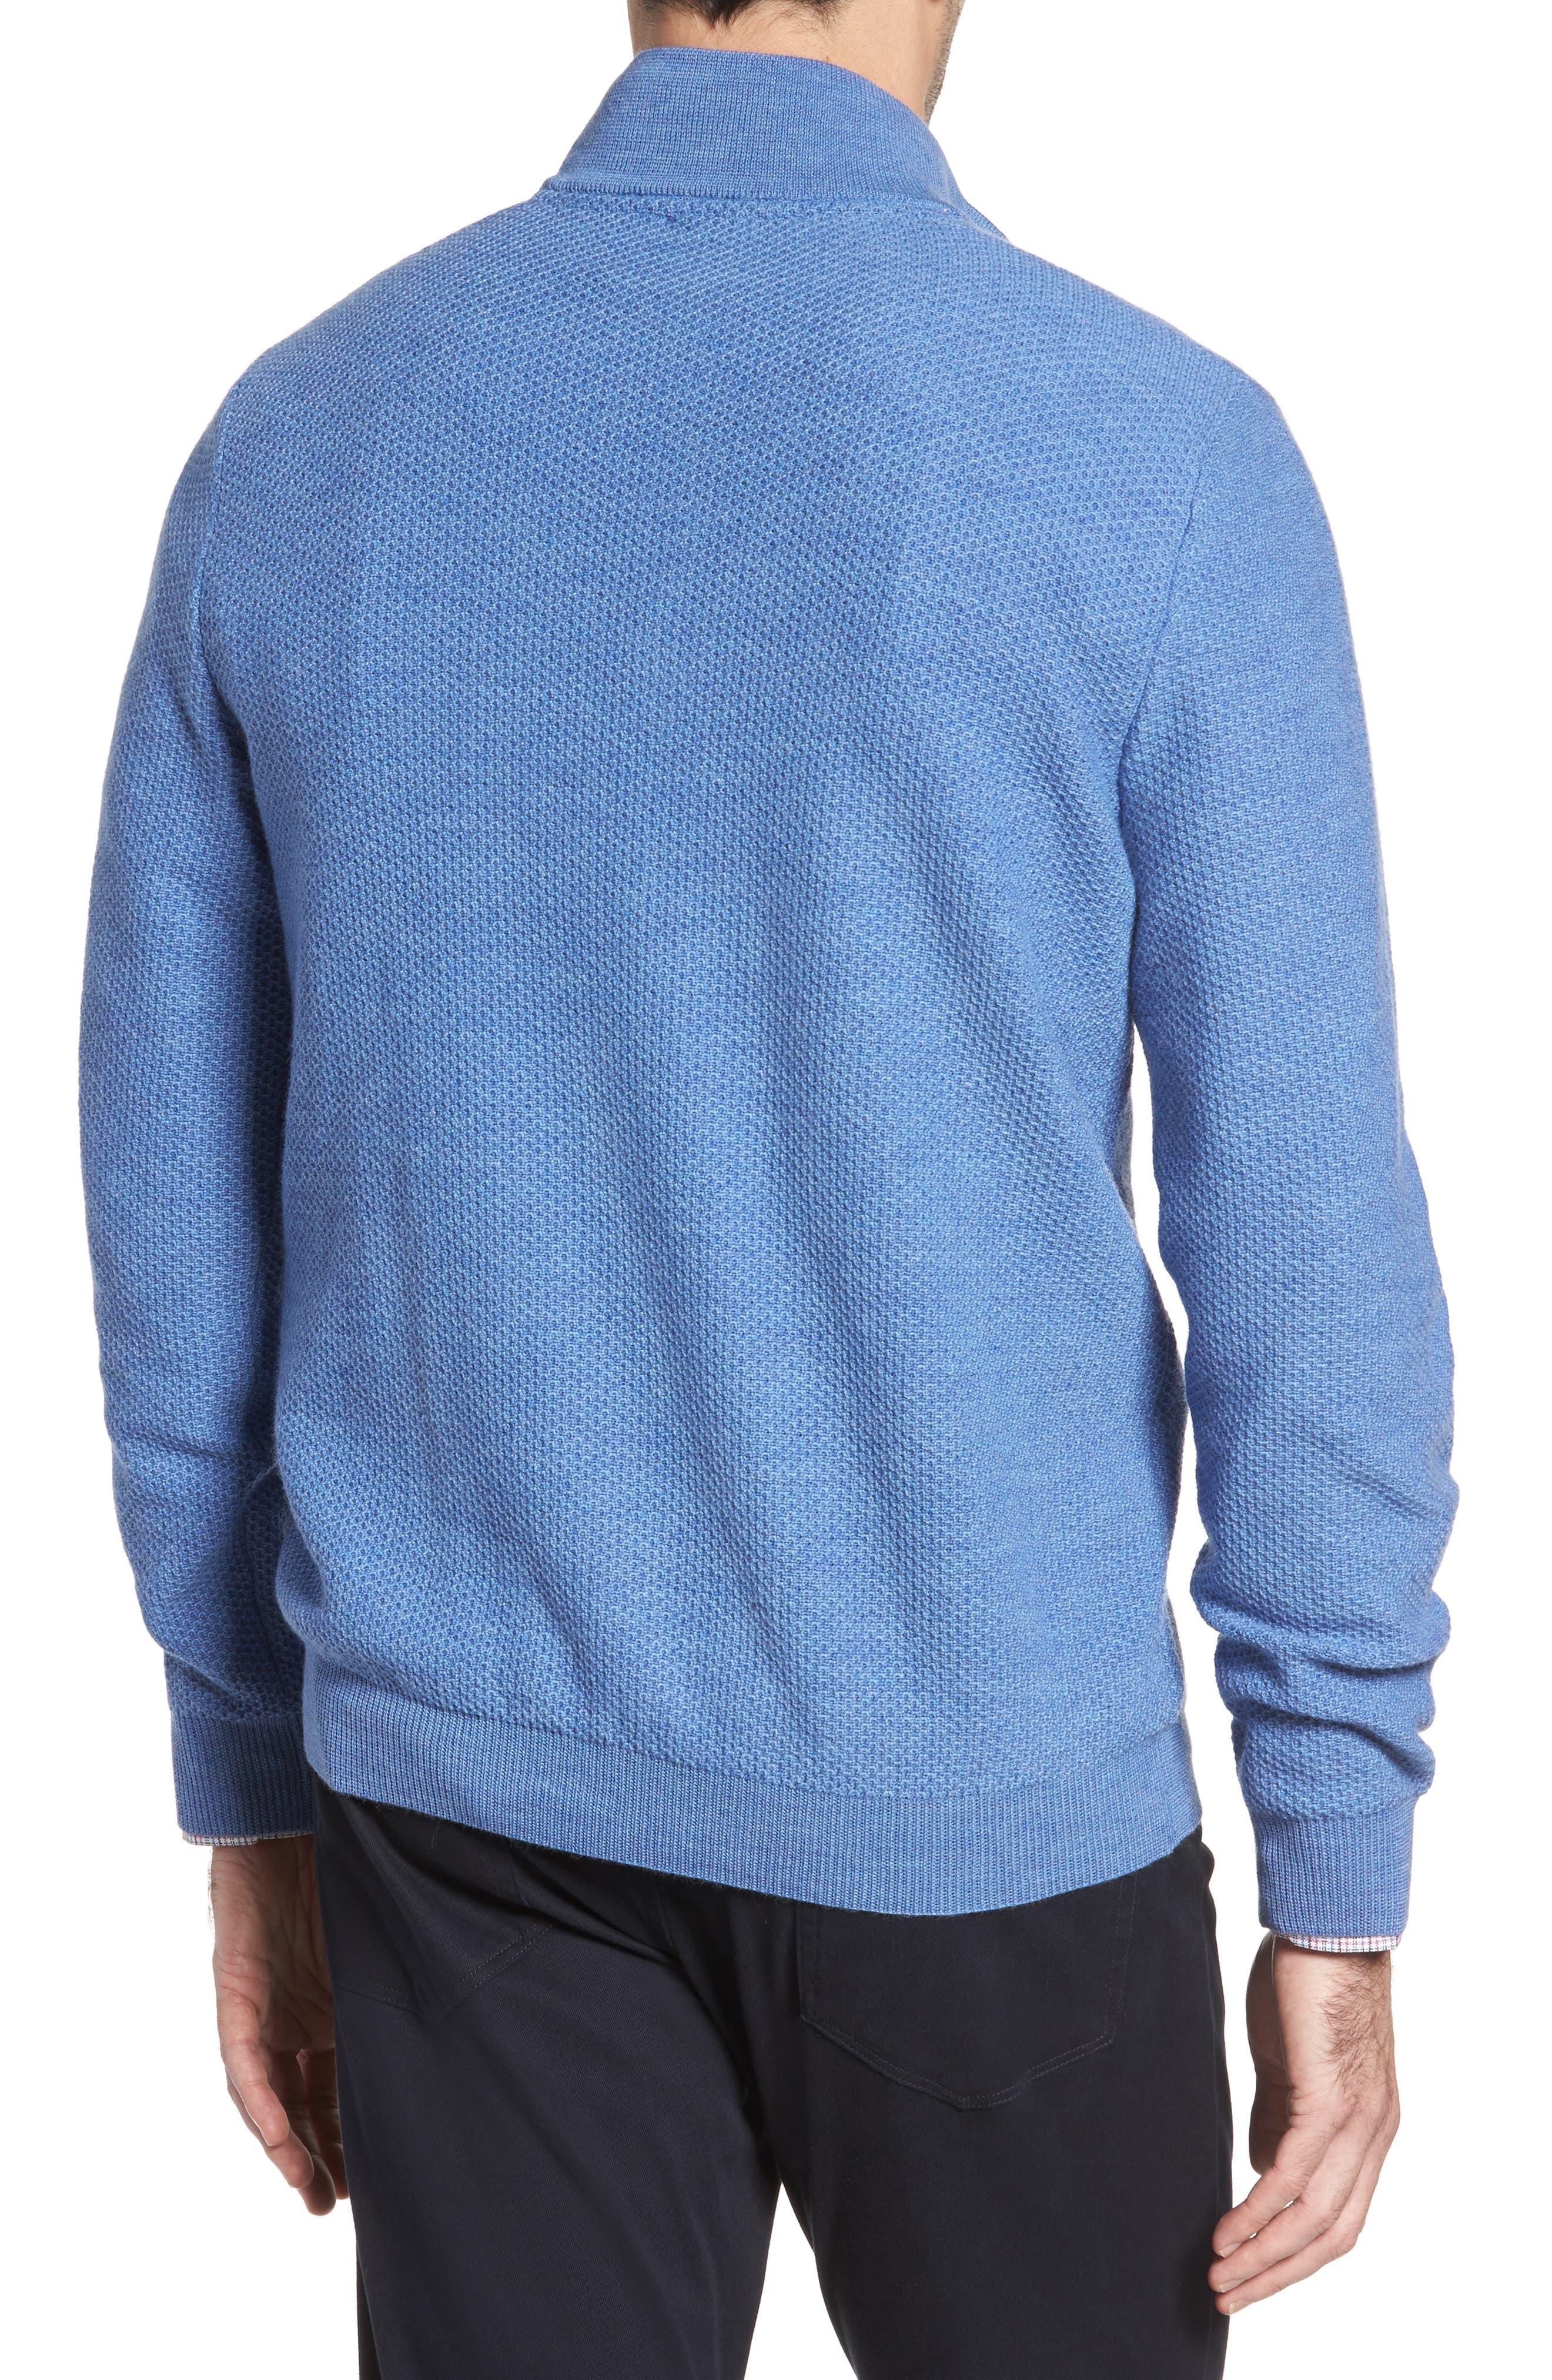 Honeycomb Merino Wool Quarter Zip Pullover,                             Alternate thumbnail 5, color,